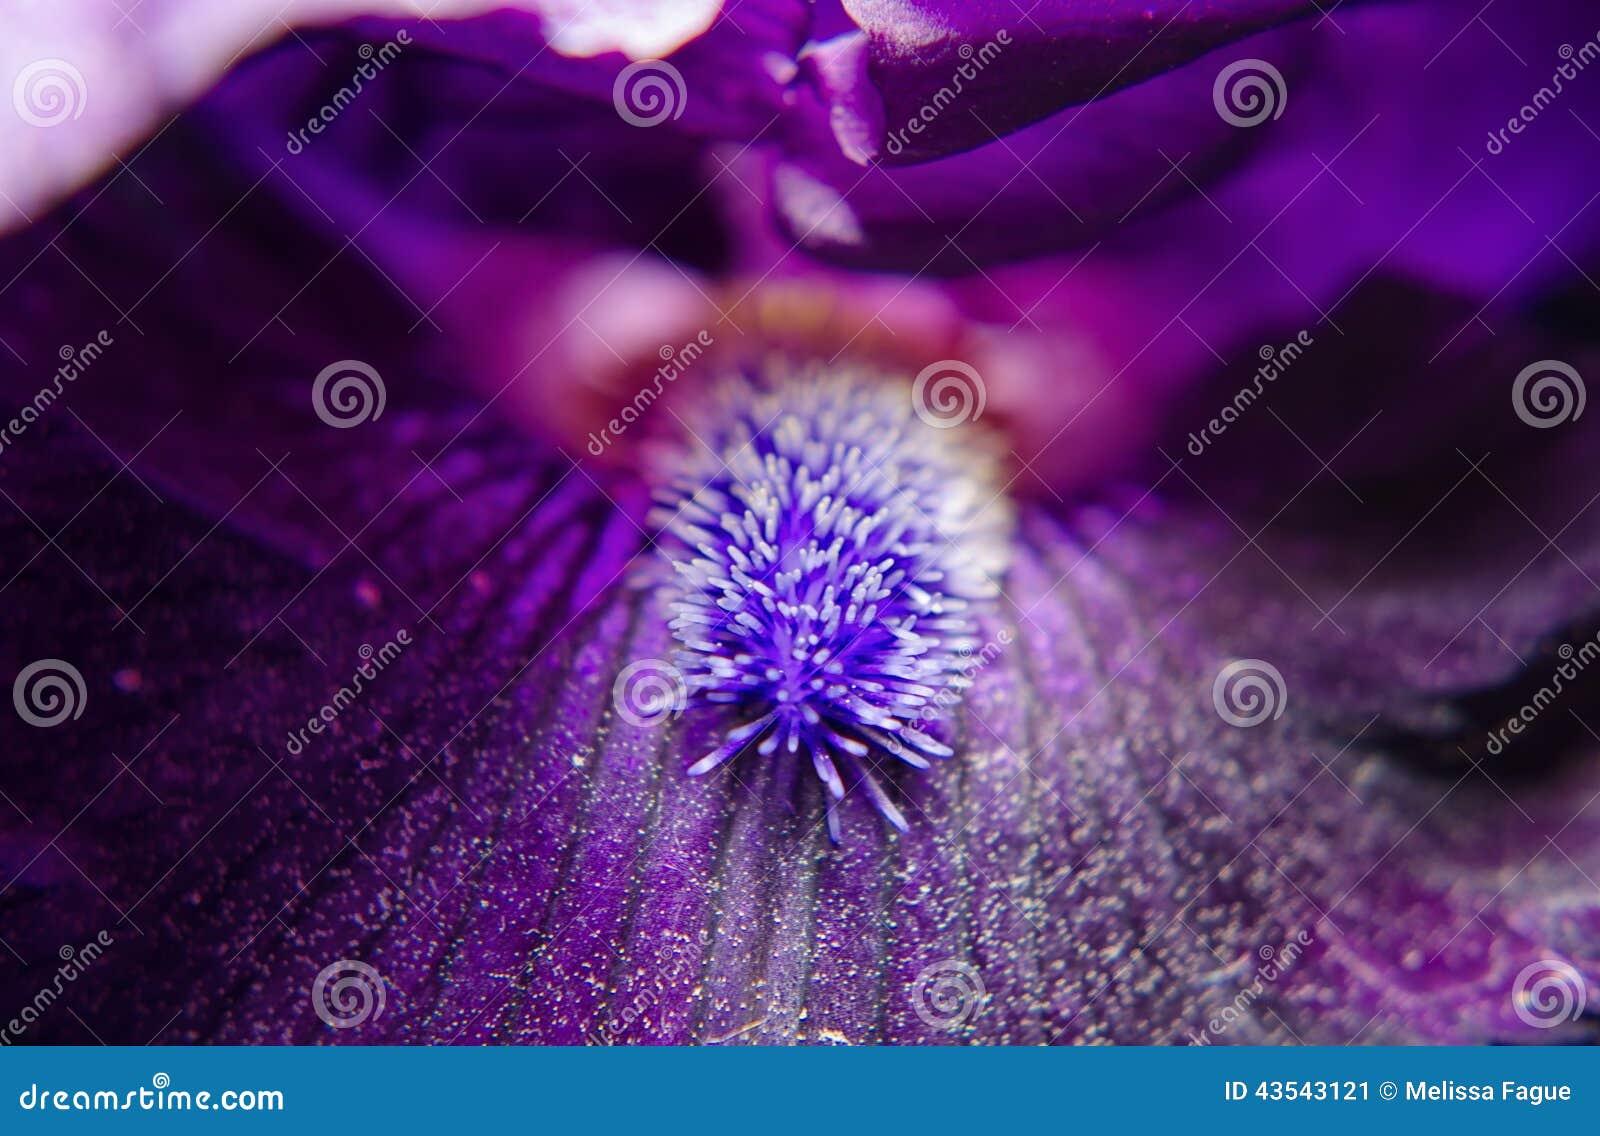 Eye Of Iris Stock Image Image Of Flower Nature Flowers 43543121